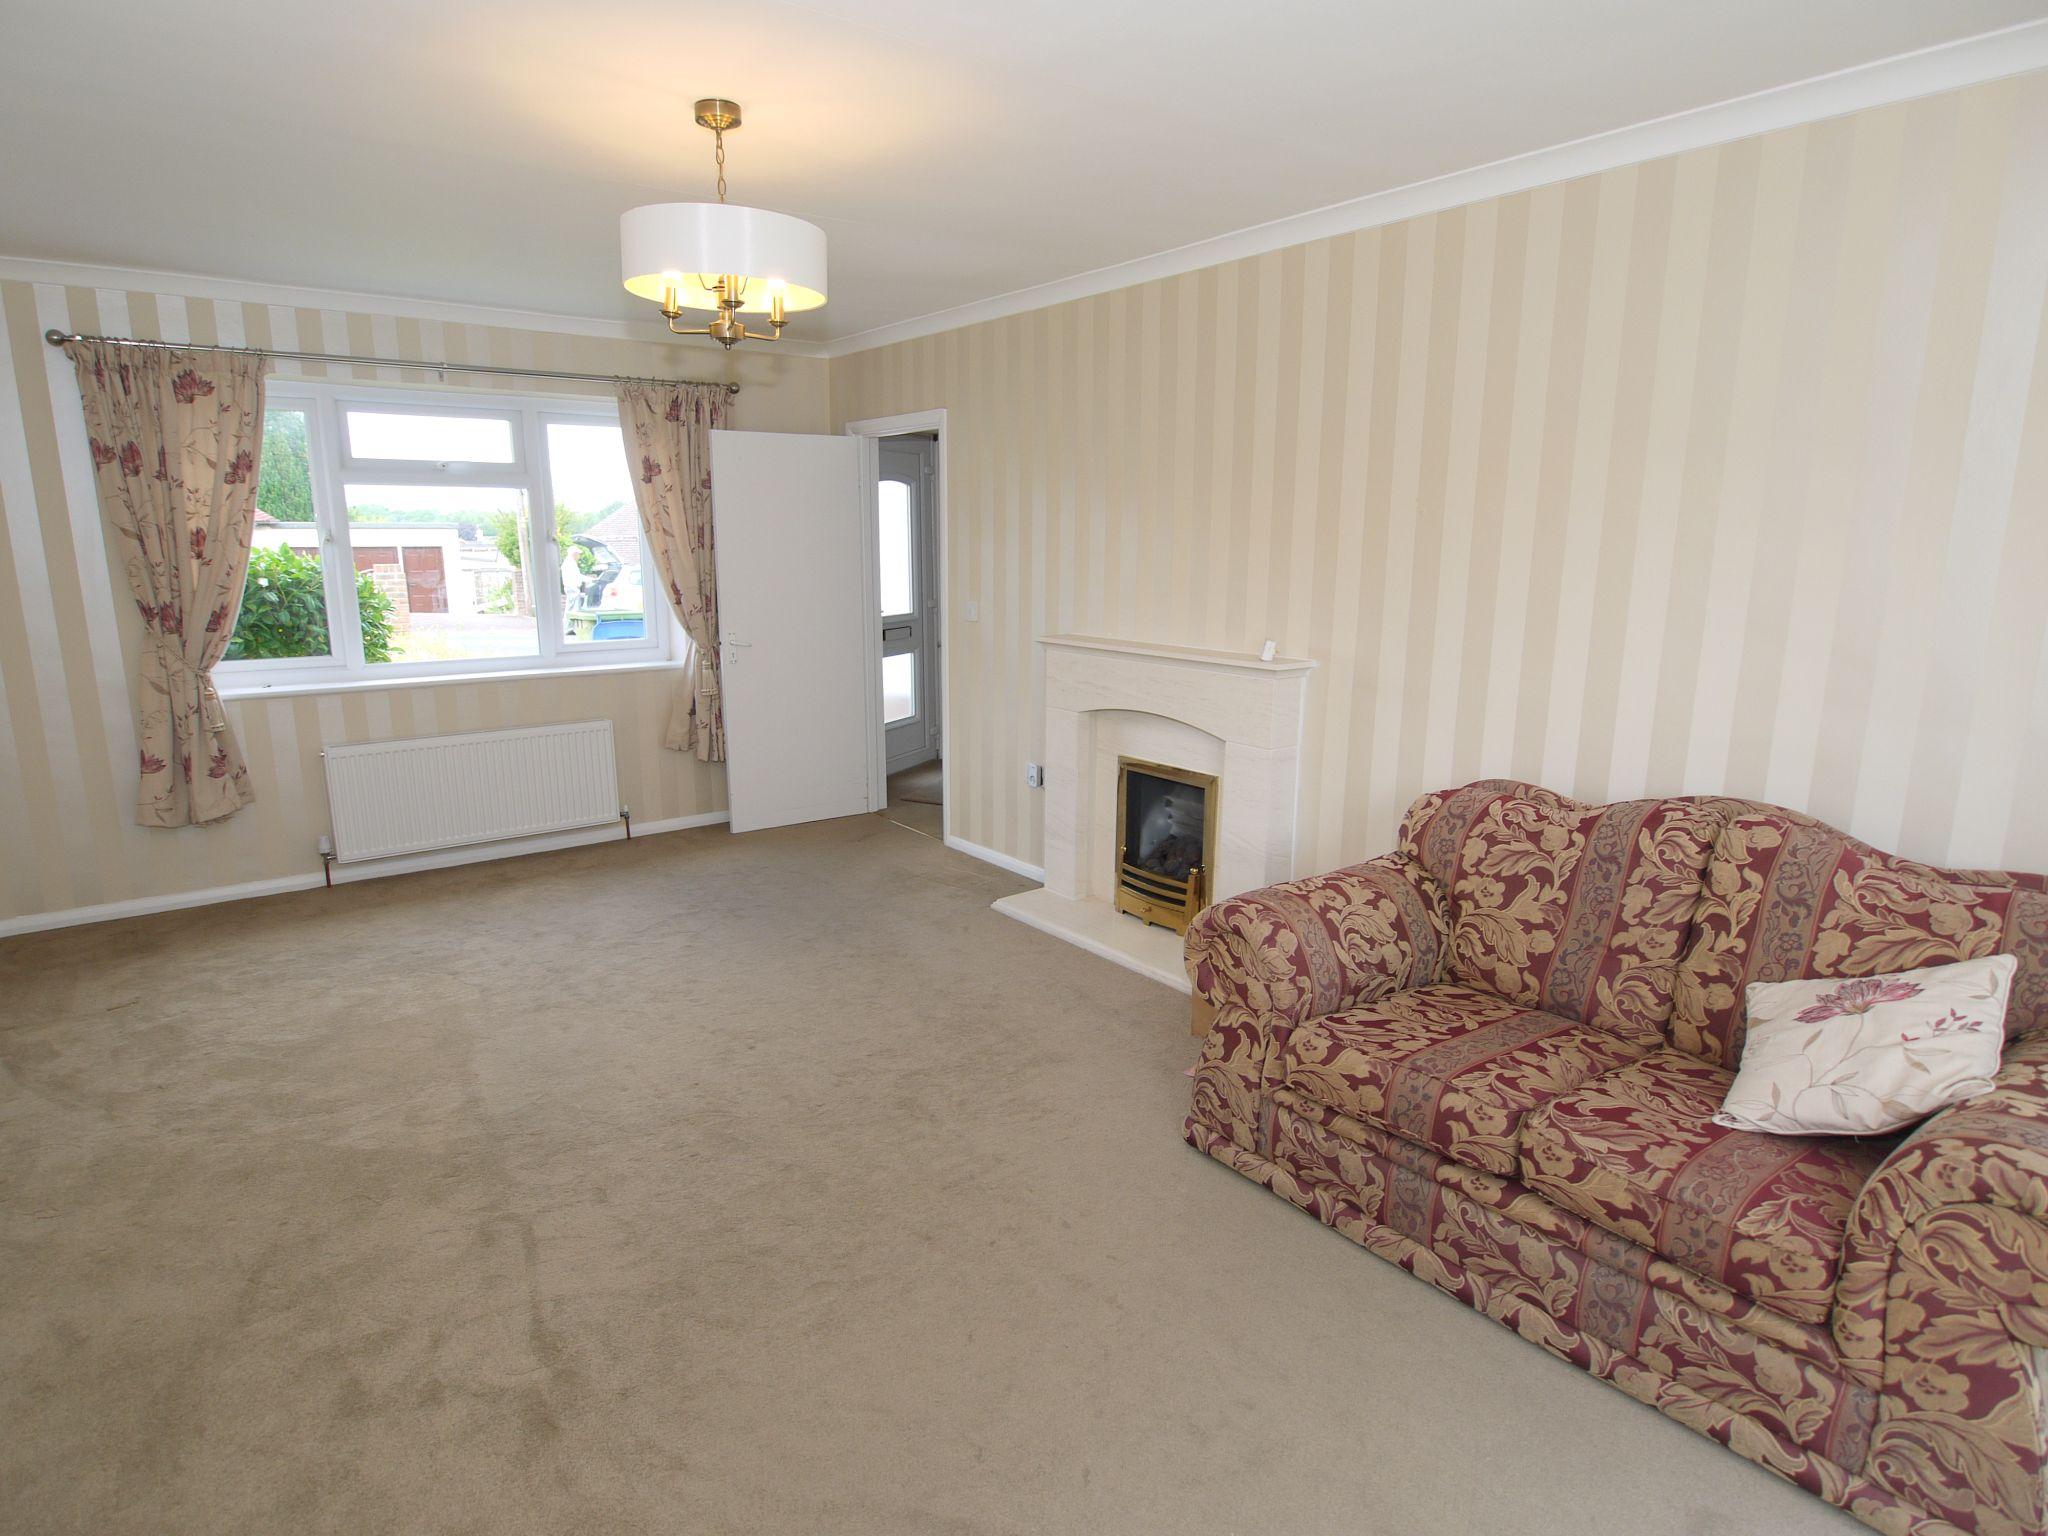 2 bedroom detached bungalow Sold in Sevenoaks - Photograph 5